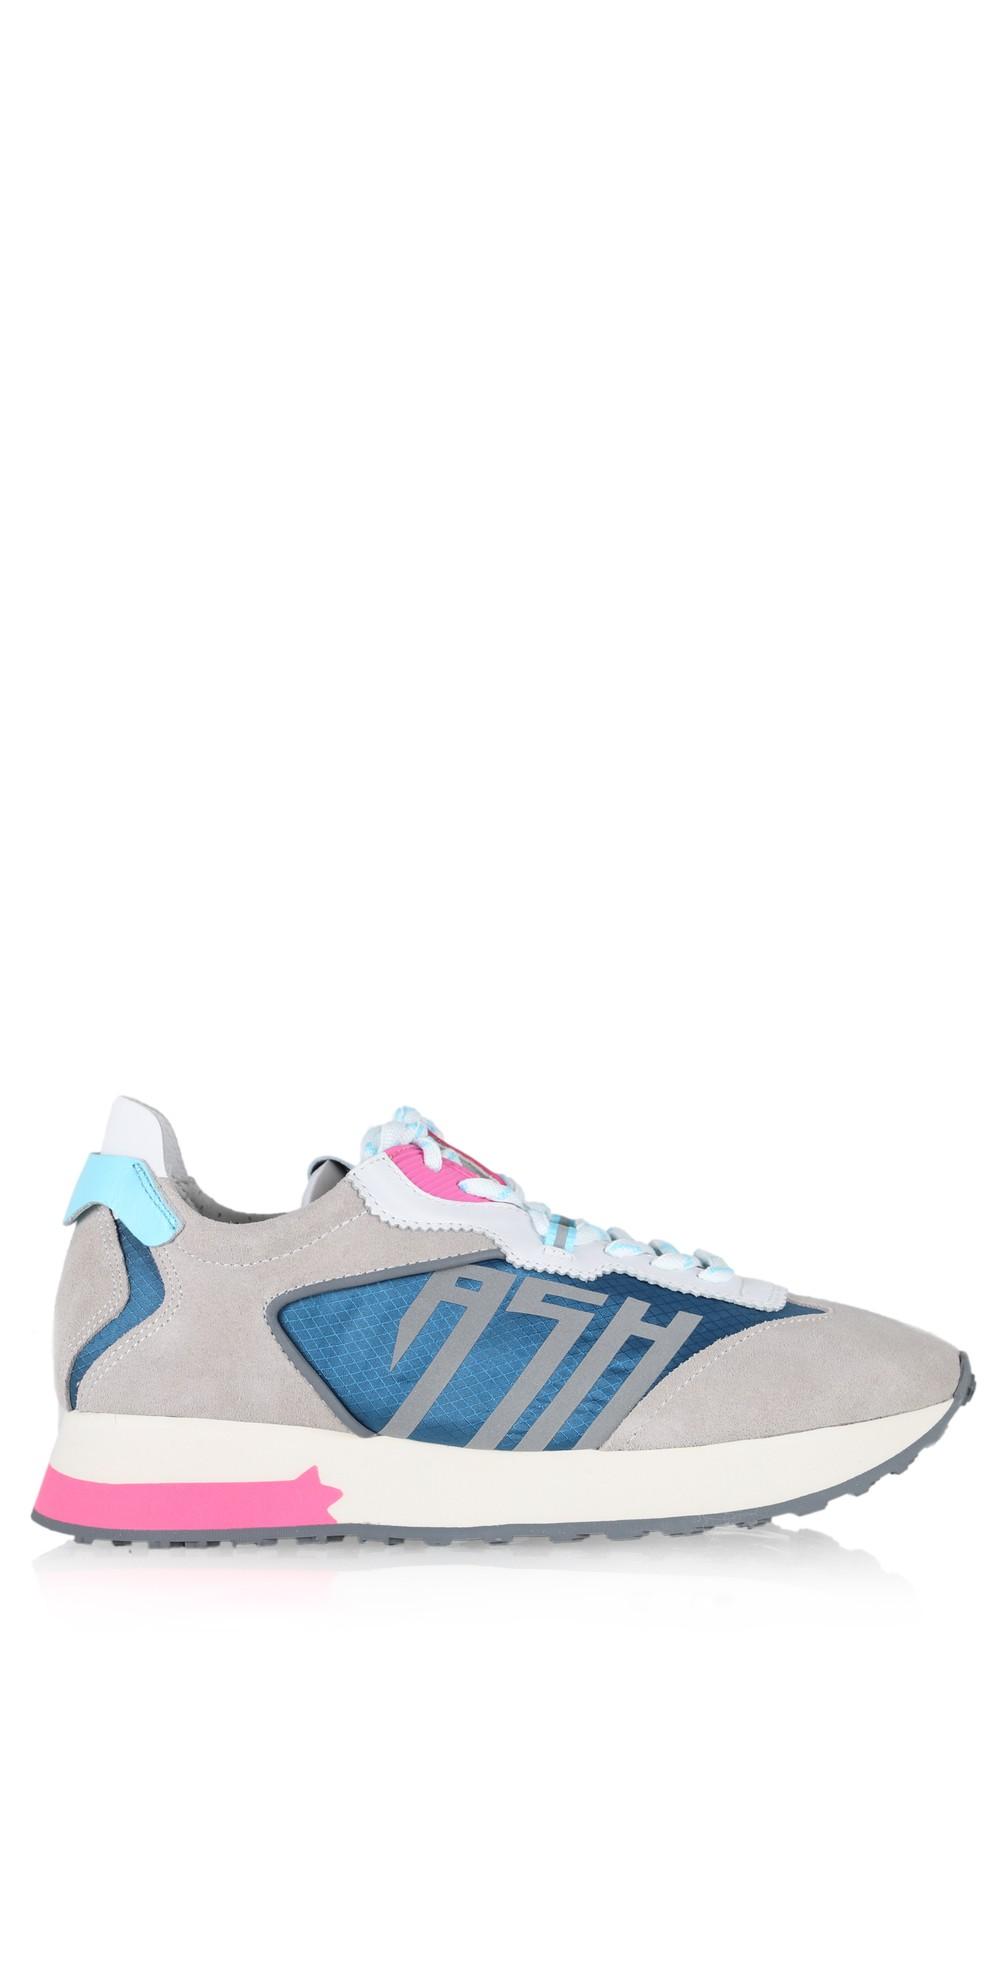 Tiger Trainer Shoe main image